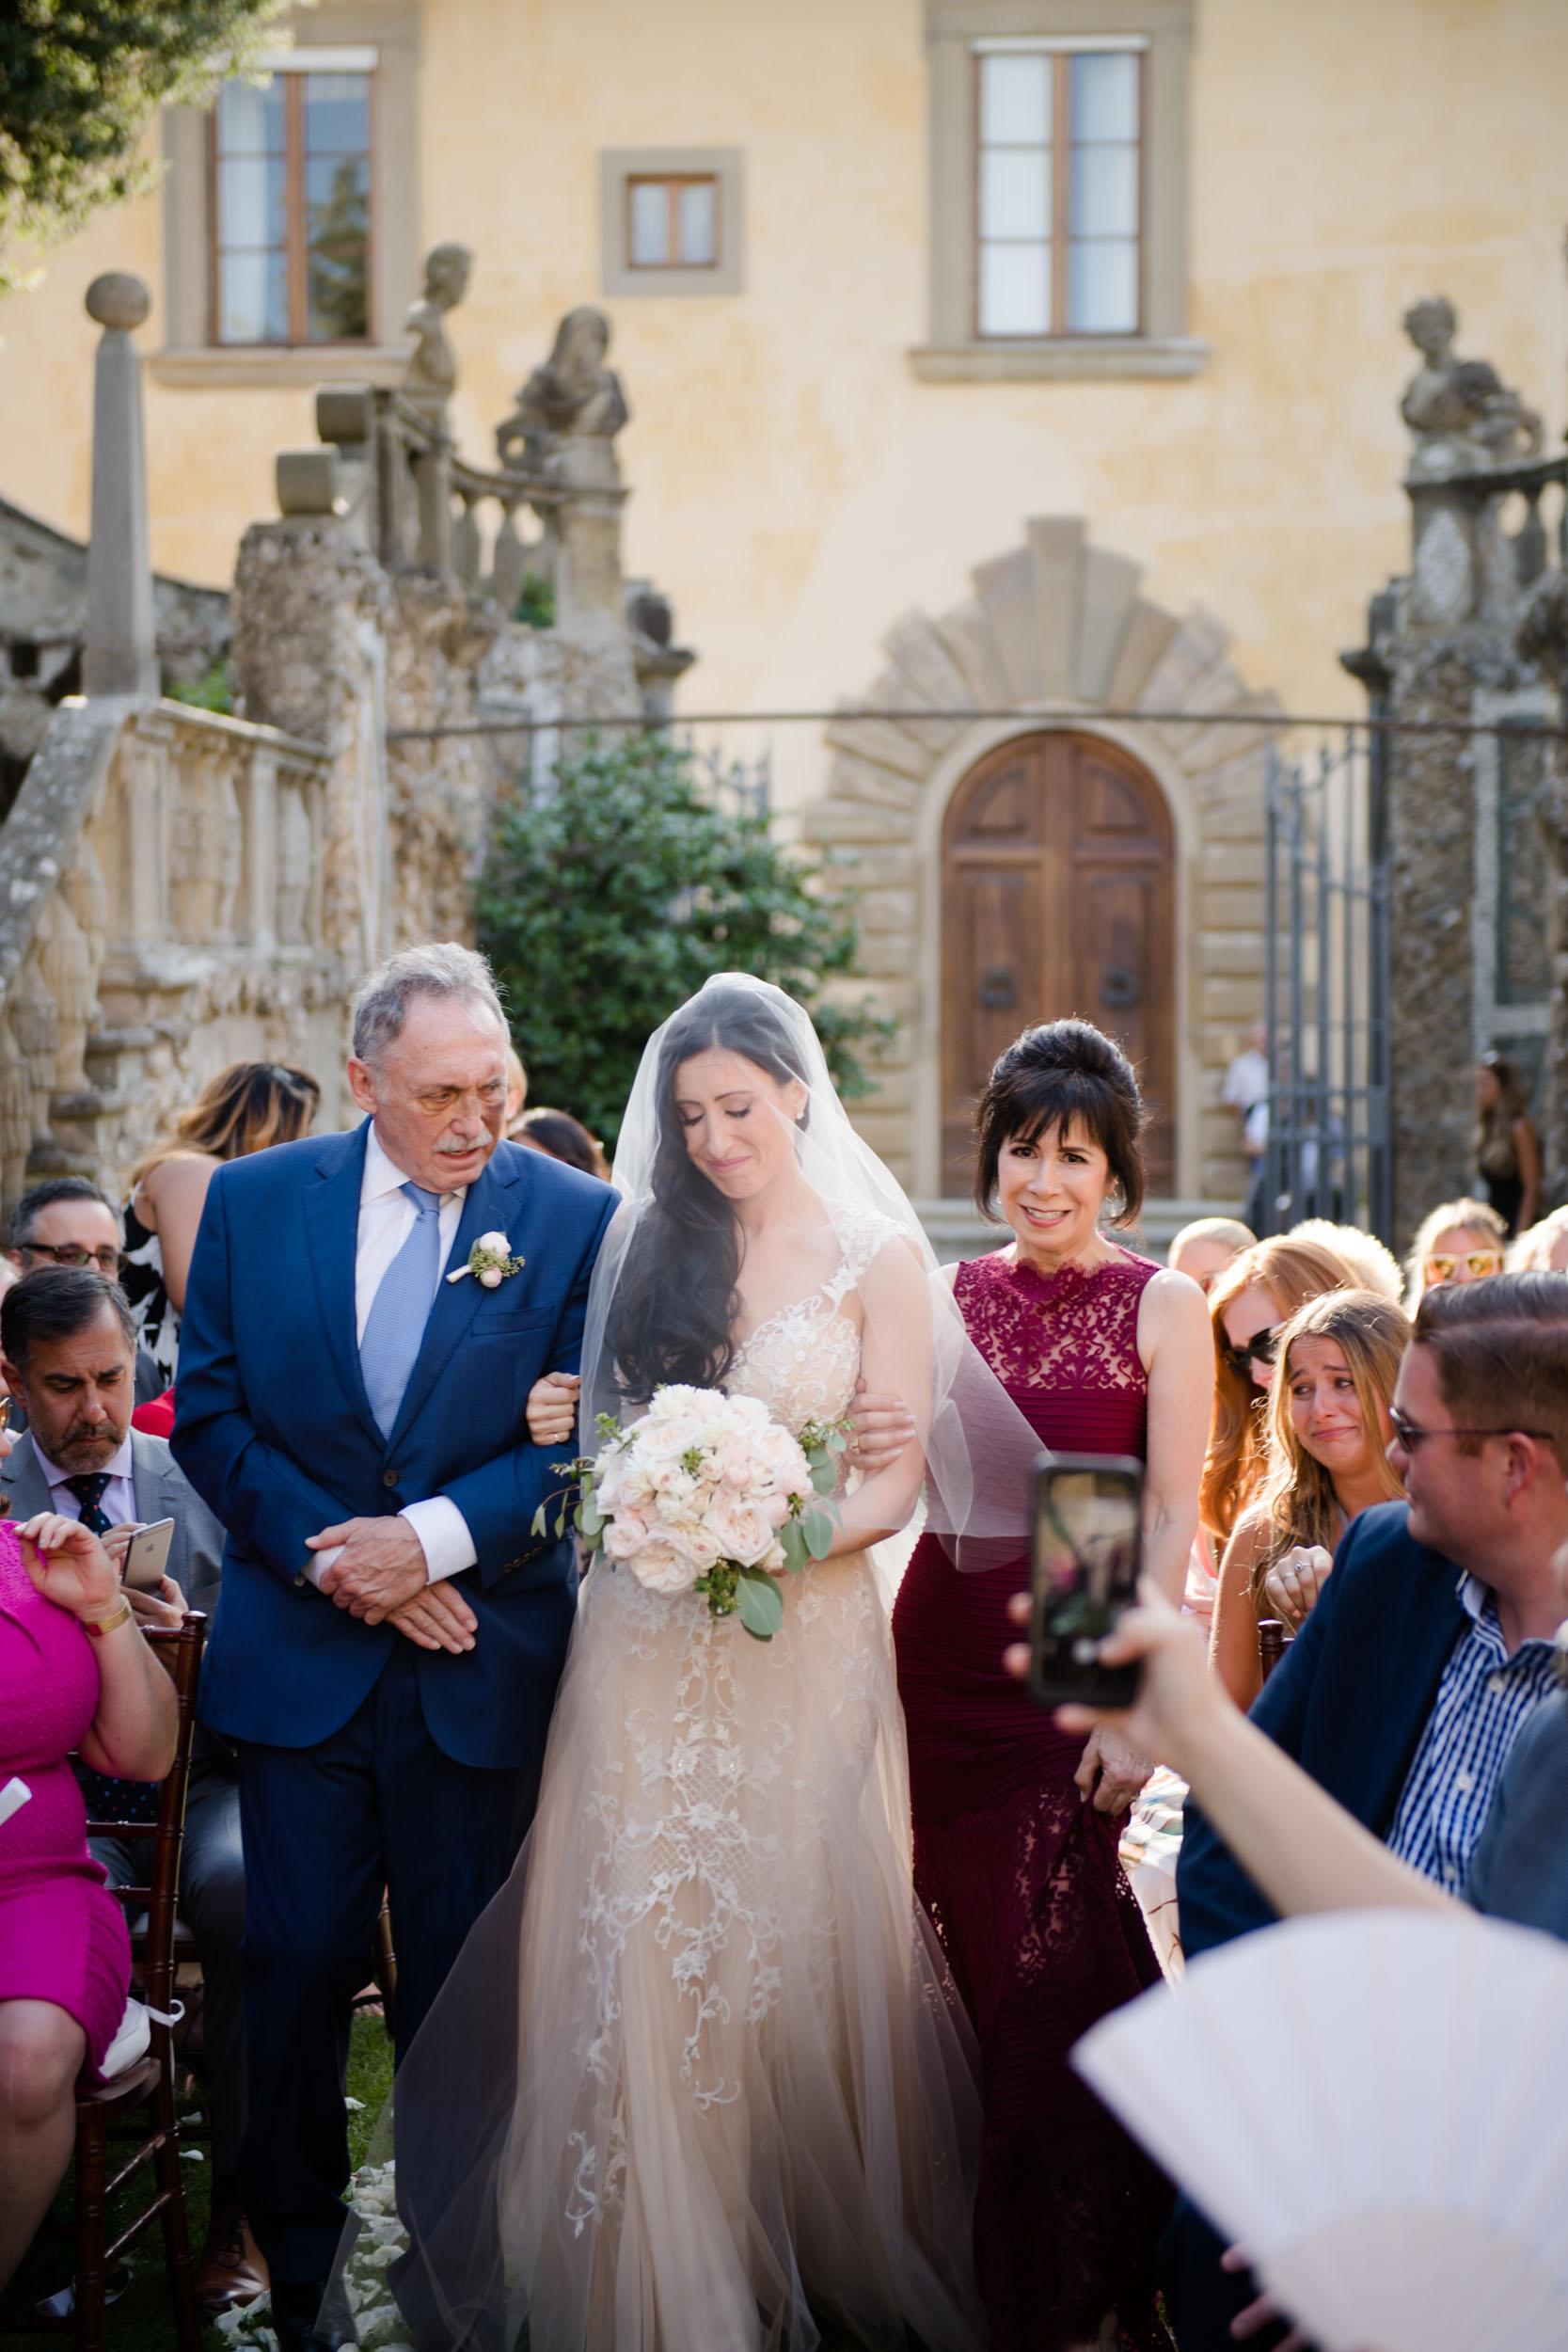 villa-gamberaia-florence-italy-destination-wedding-43.jpg